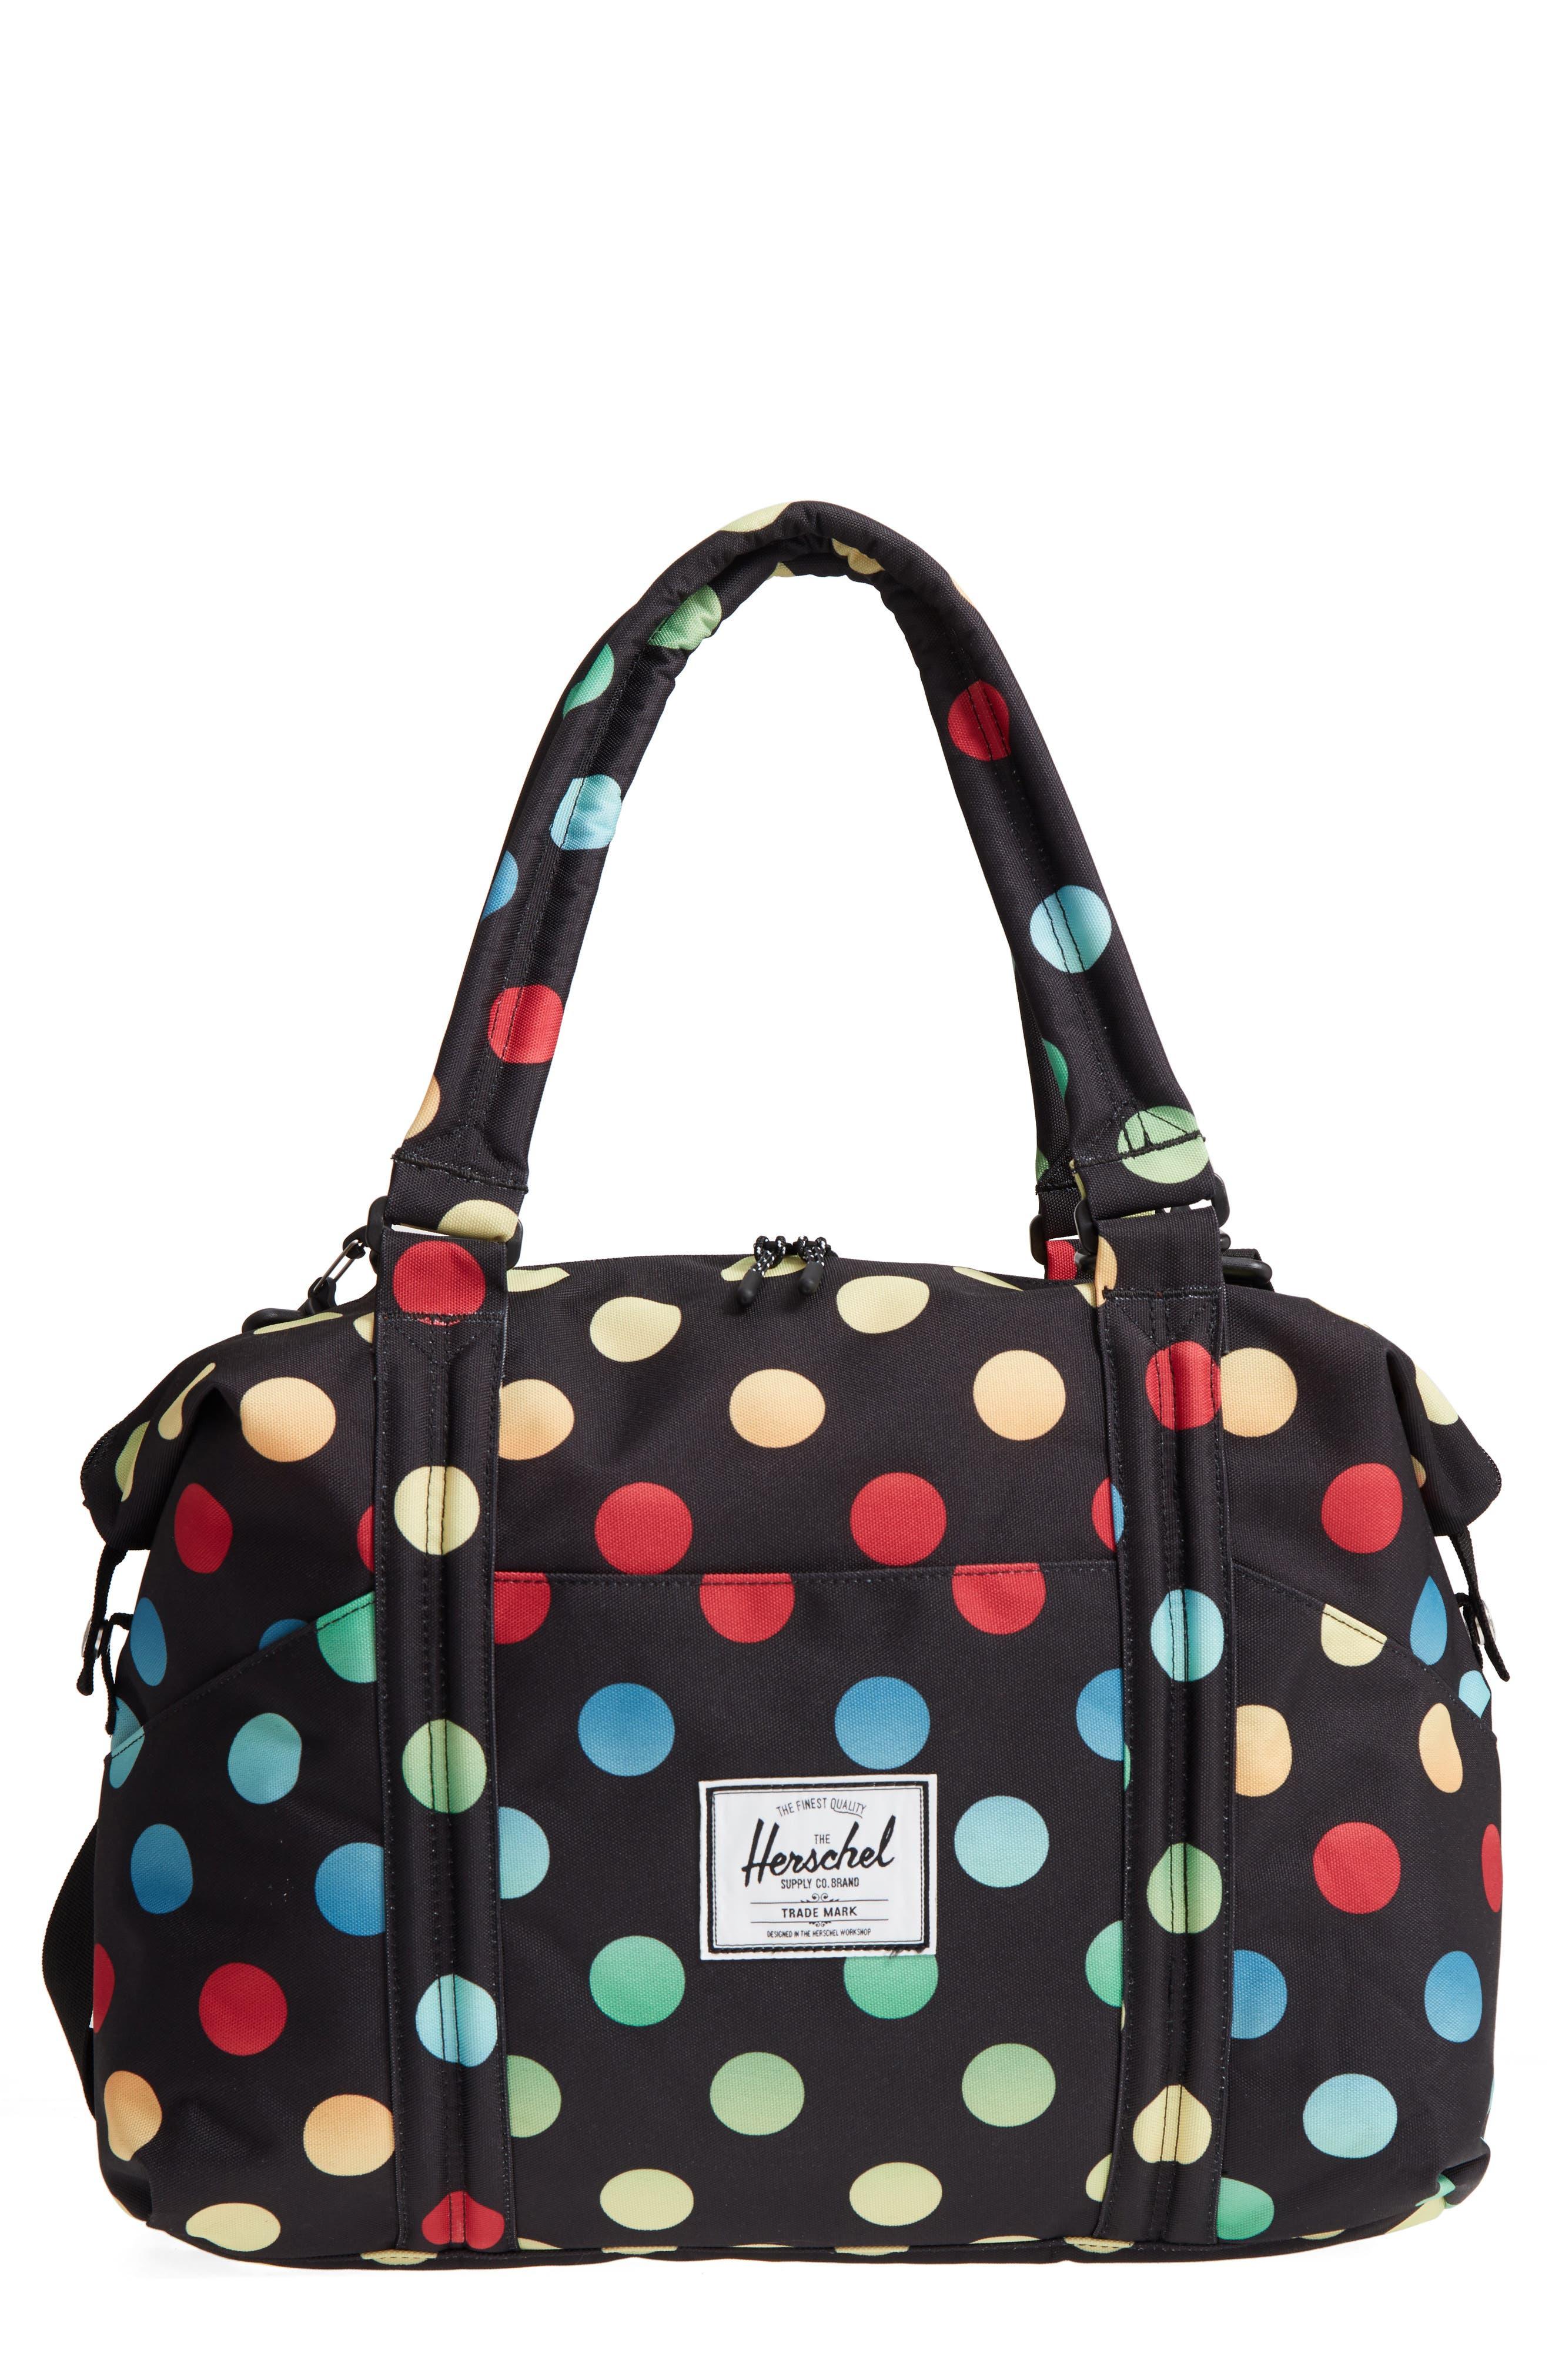 Herschel Supply Co. Sprout Diaper Bag